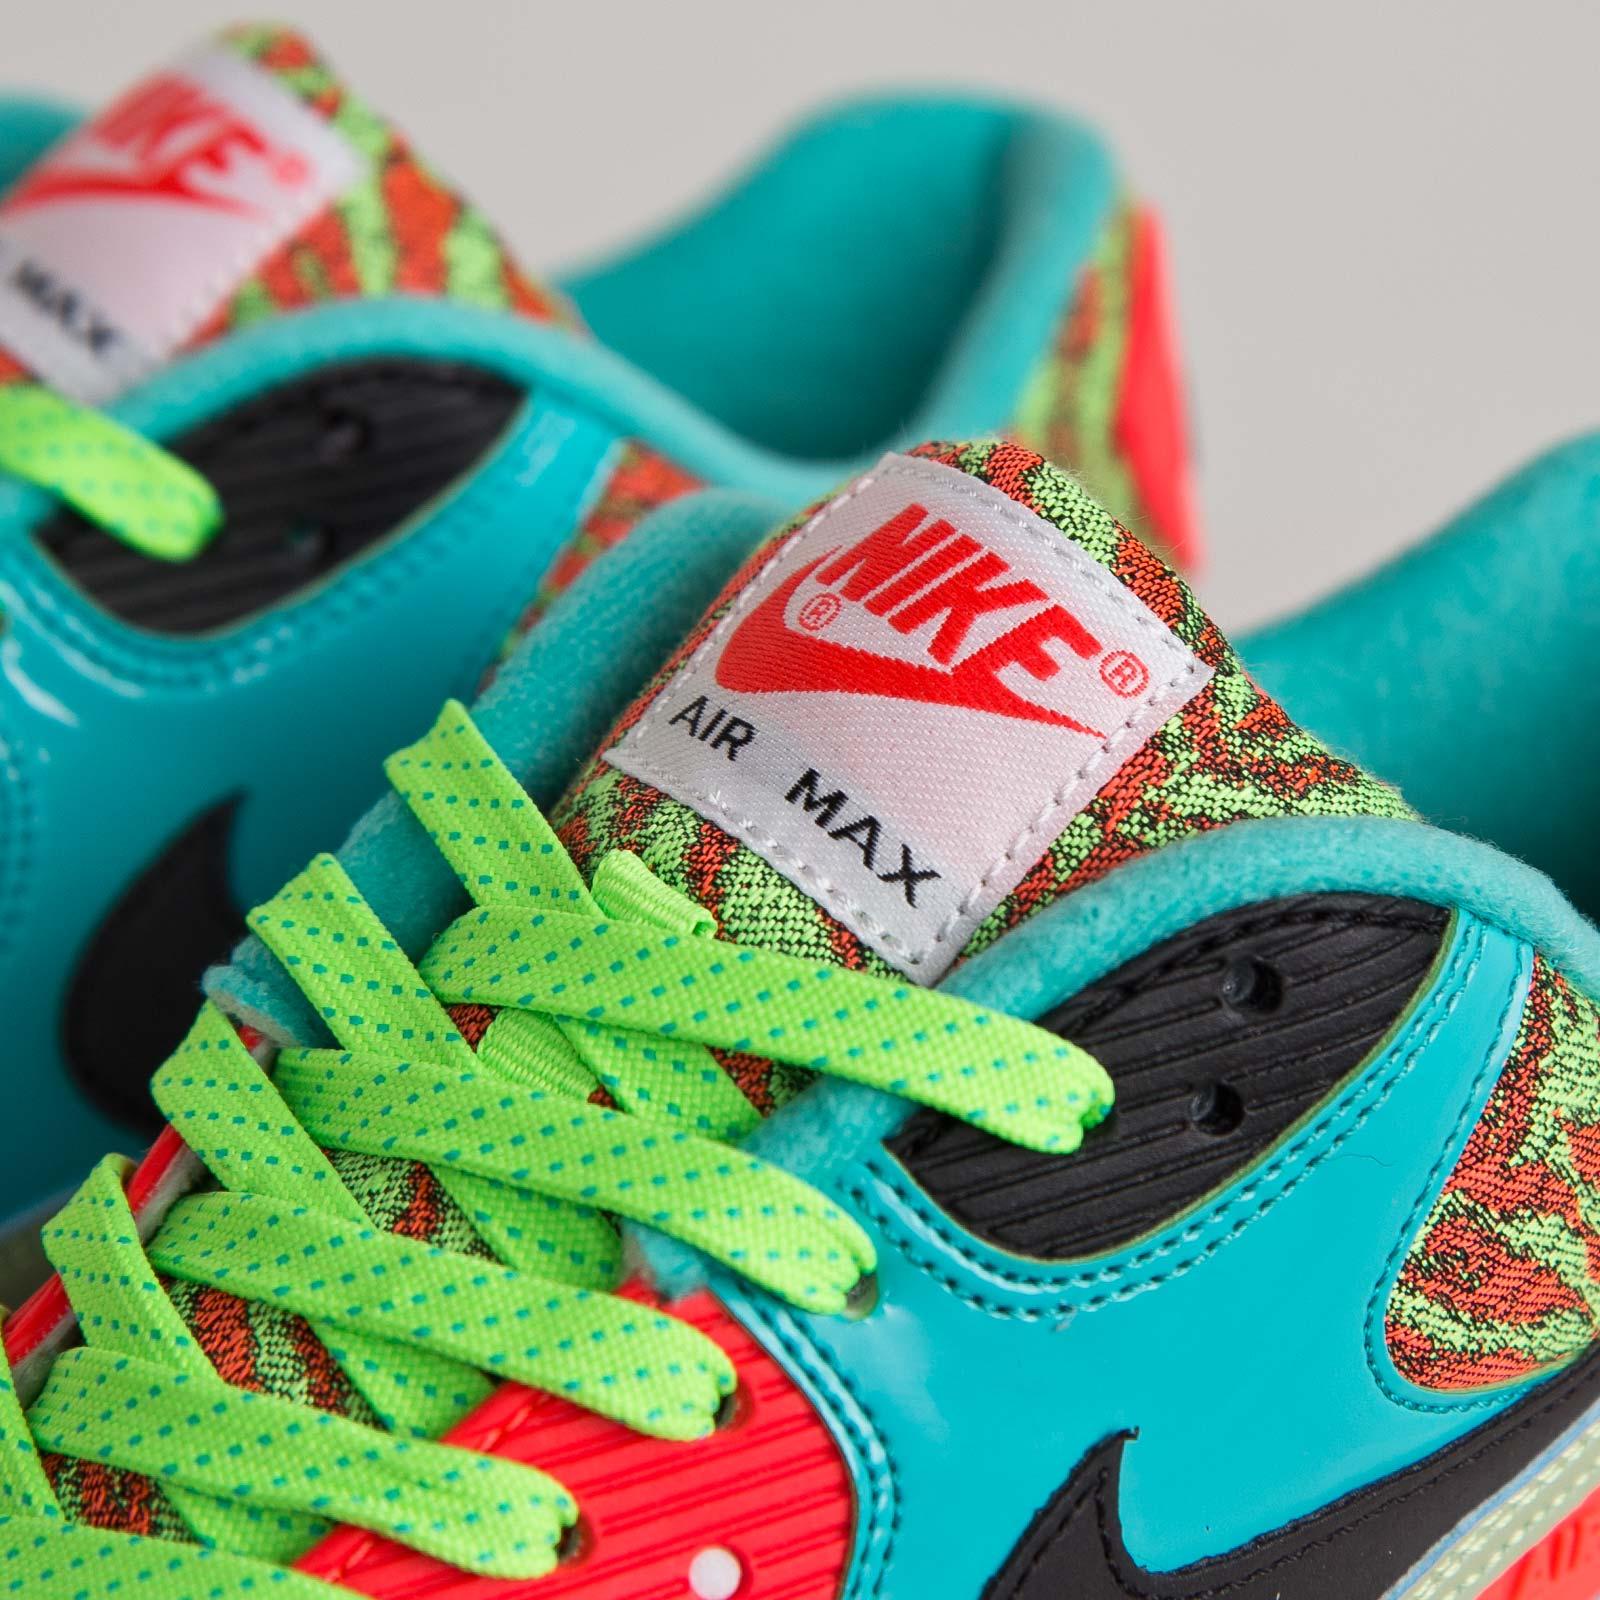 new style 119ad 1c690 Nike Air Max 90 Anniversary - 725235-306 - Sneakersnstuff   sneakers    streetwear online since 1999